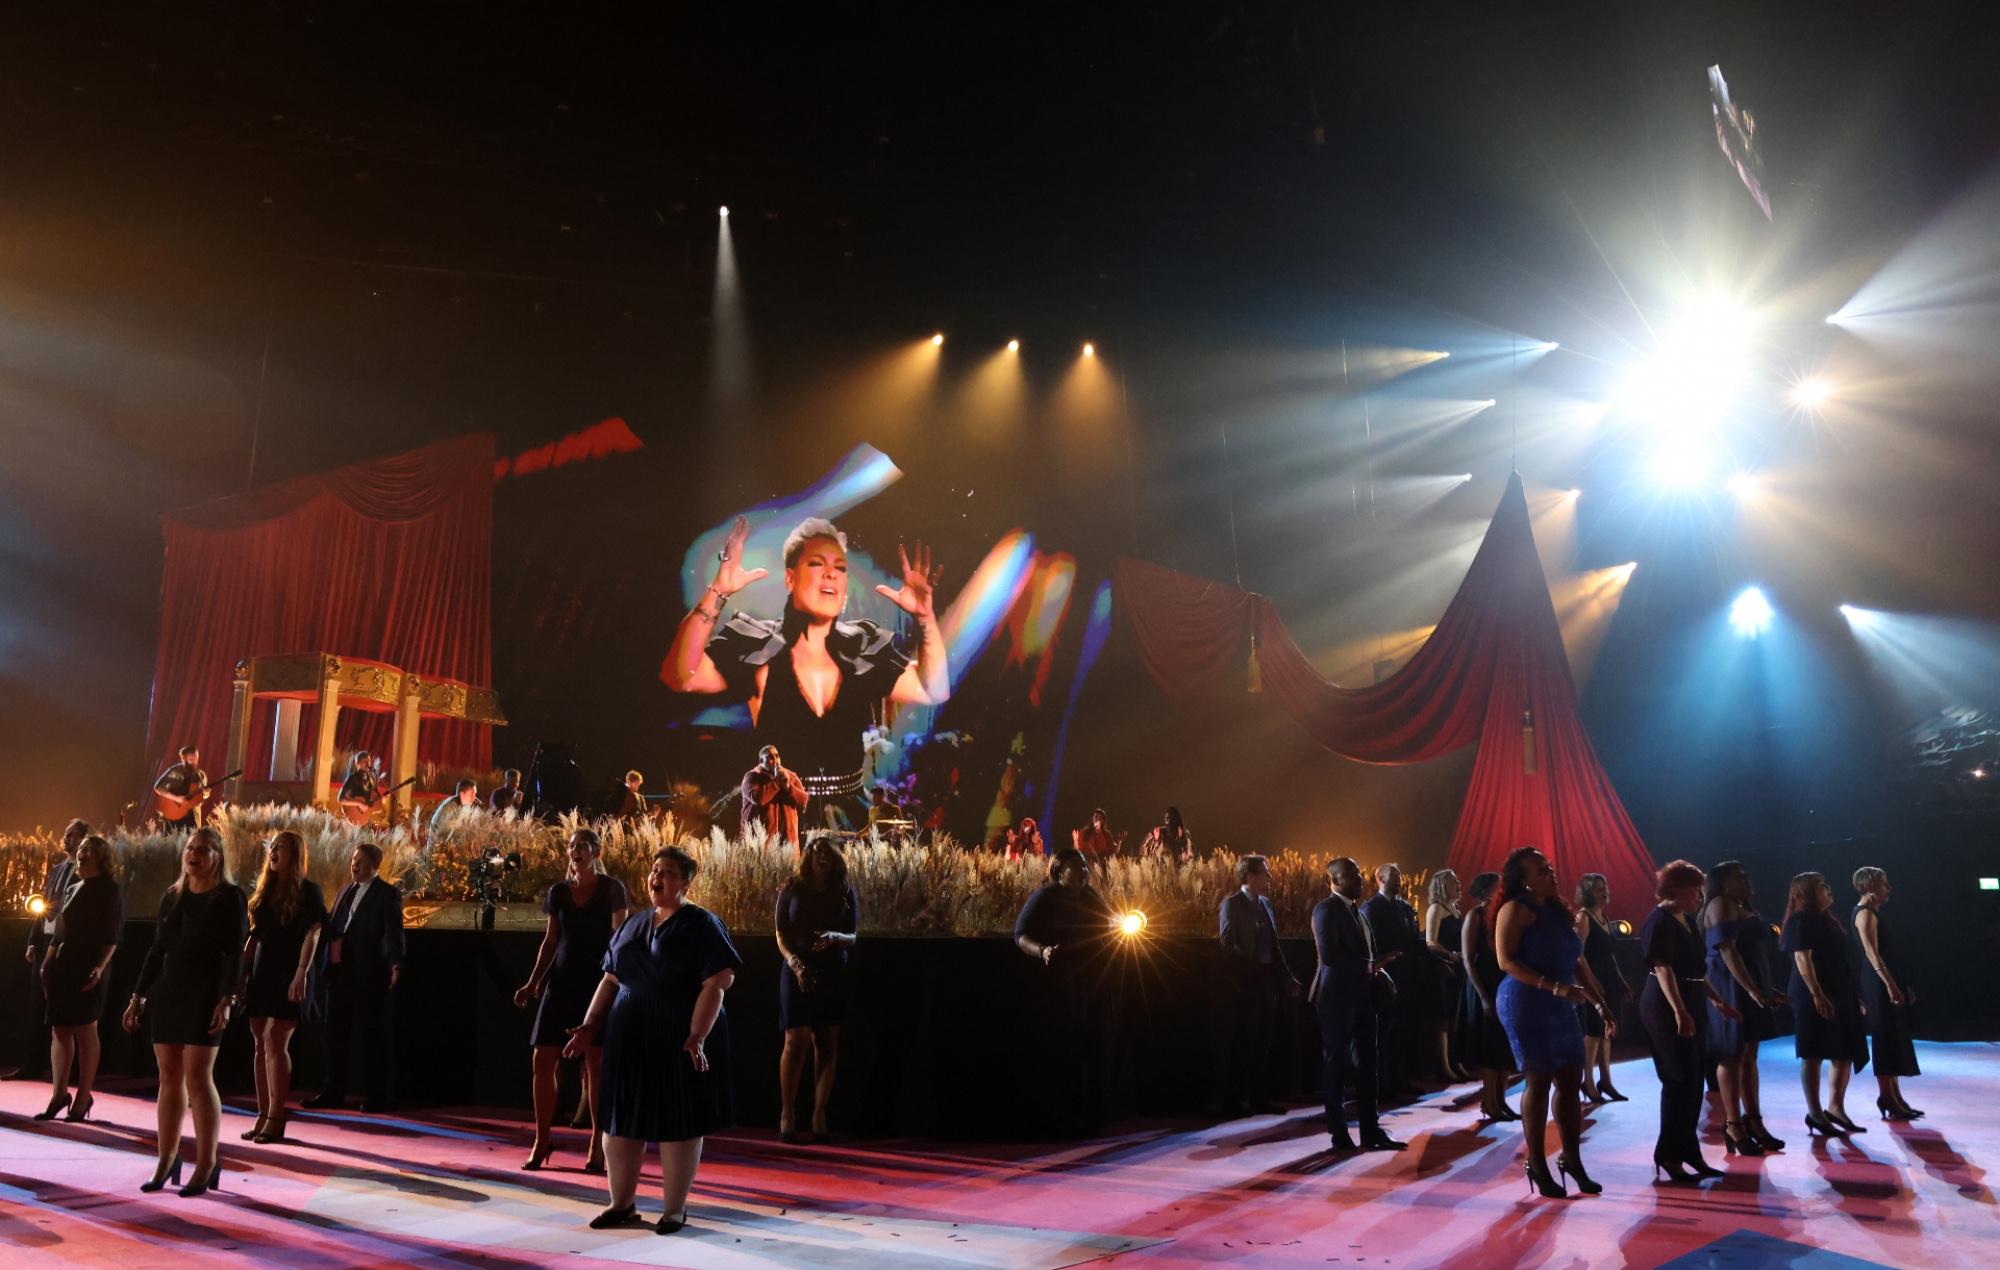 BRIT Awards 2021 records zero COVID cases as government test event